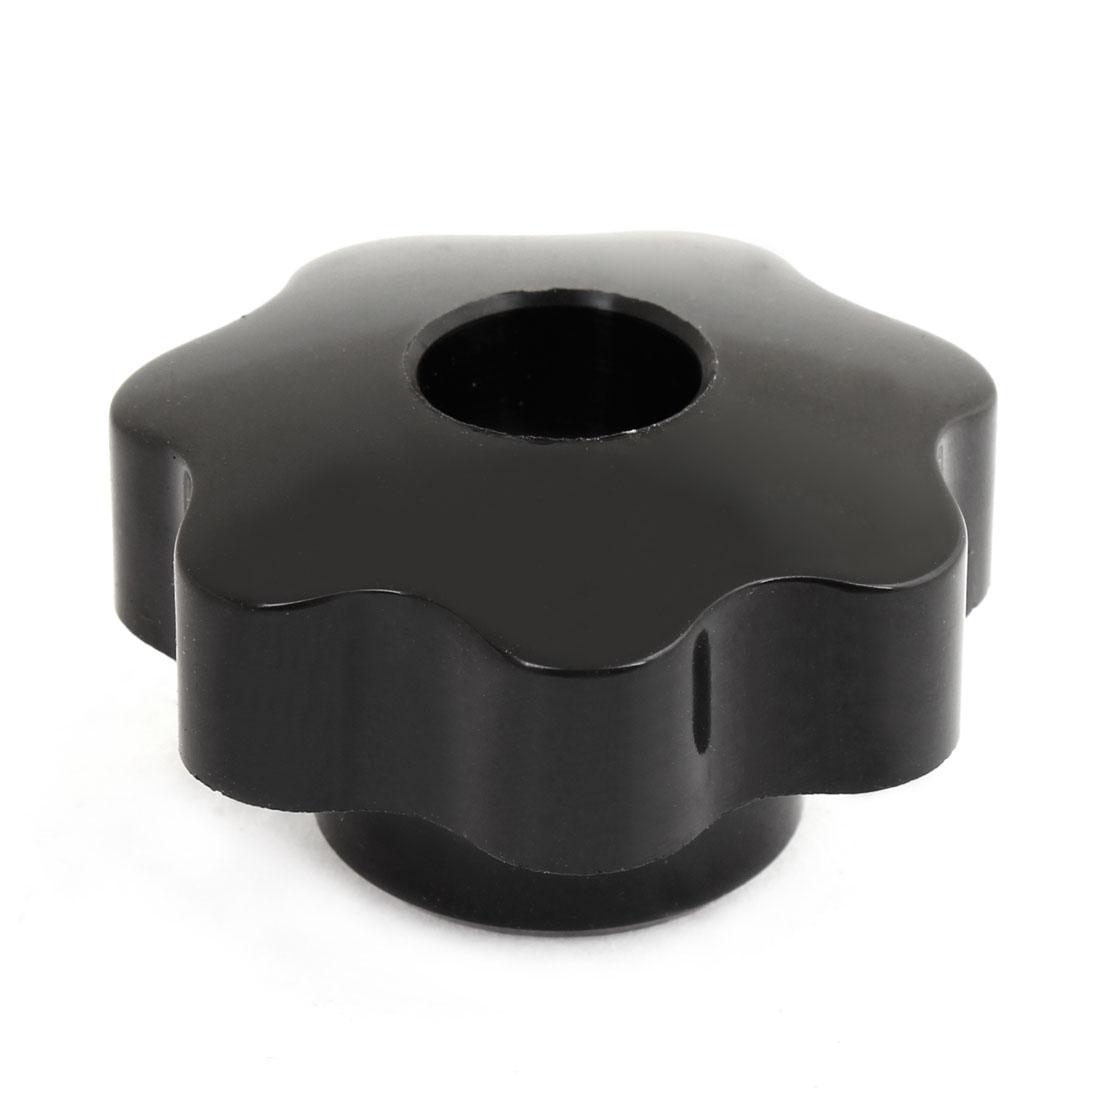 8mm Female Thread Black Plastic 50mm Diameter Star Clamping Screw Knob